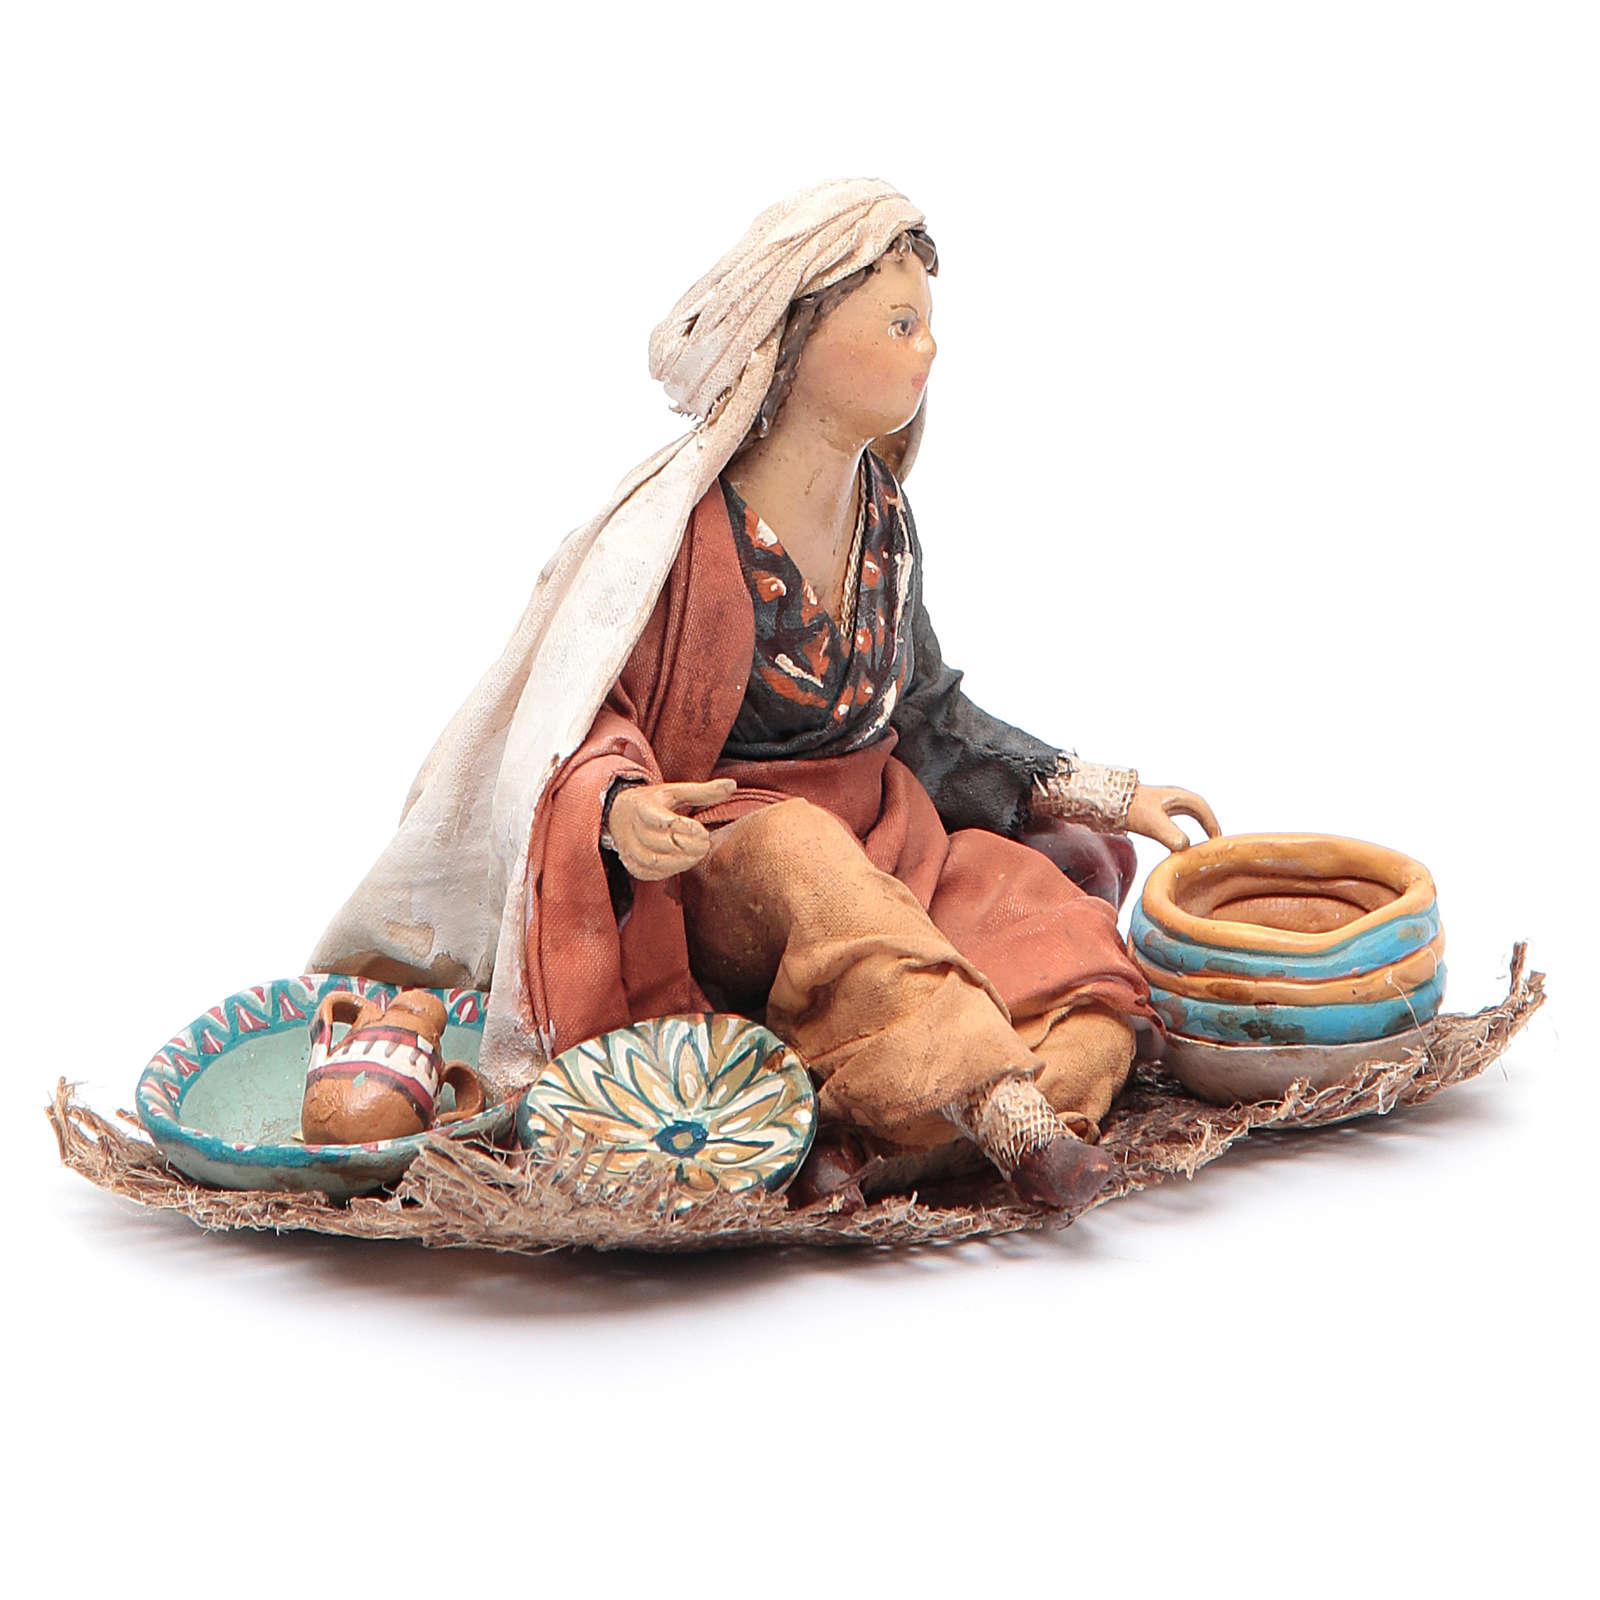 Femme assise avec vaisselle 13 cm Angela Tripi 4